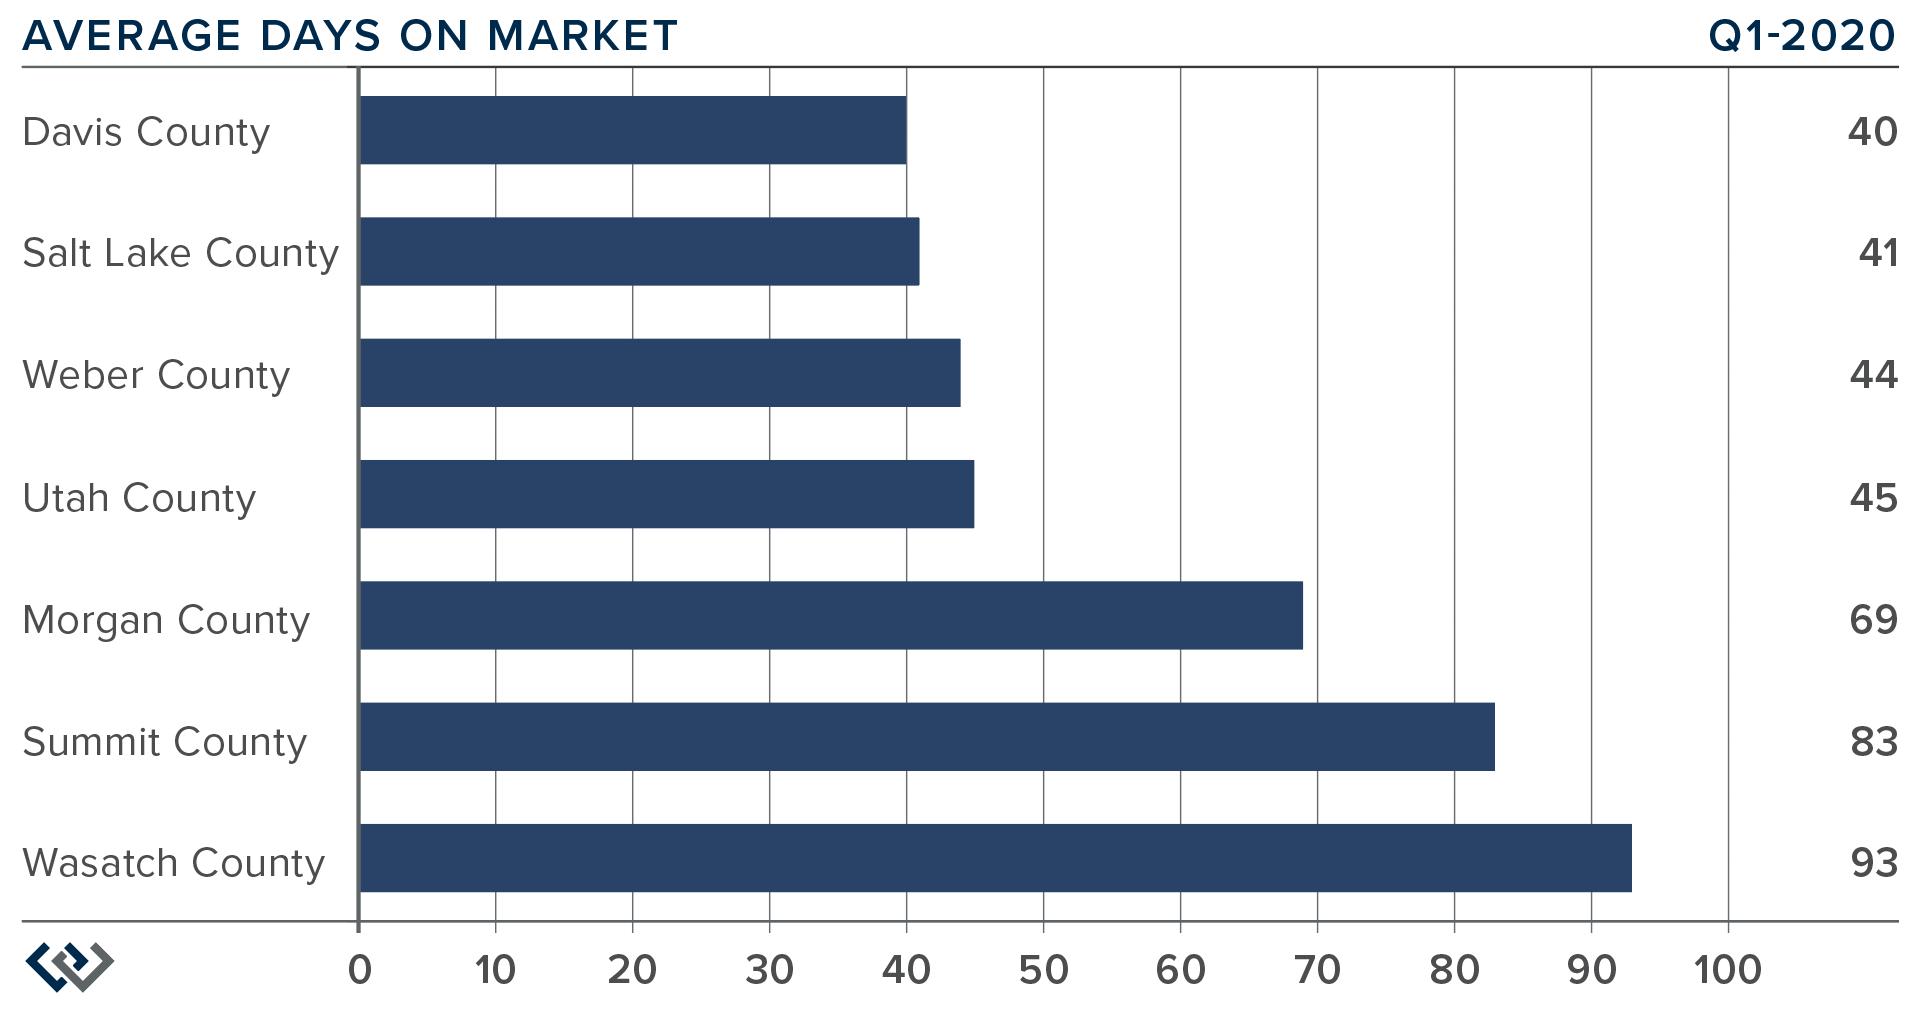 Windermere-Gardner-Report-Utah-Market-Trends-Average-Days-Market-Quarter-1-2020